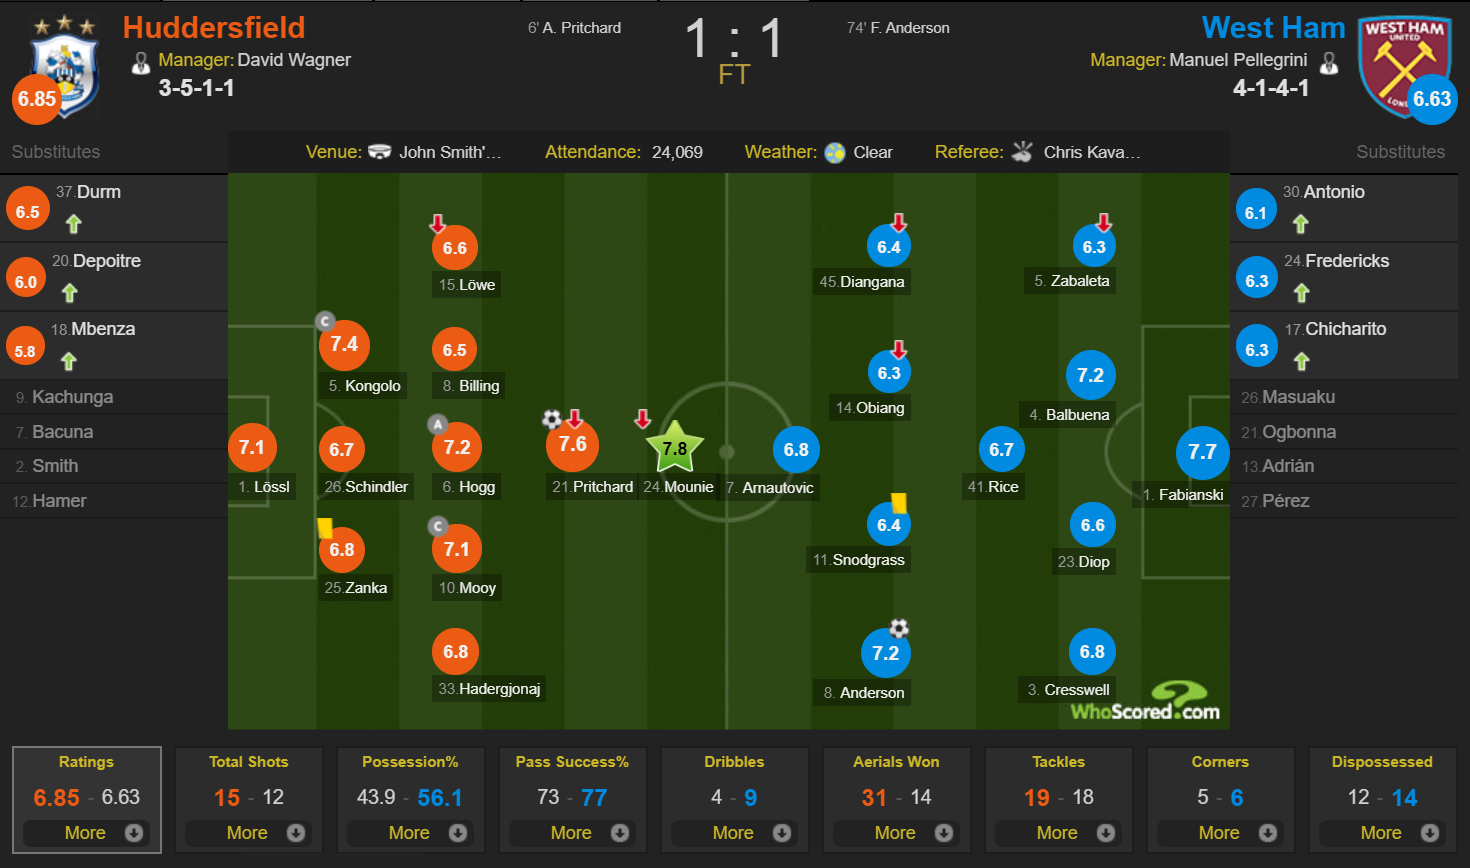 Huddersfield vs WHU WhoScored raitings